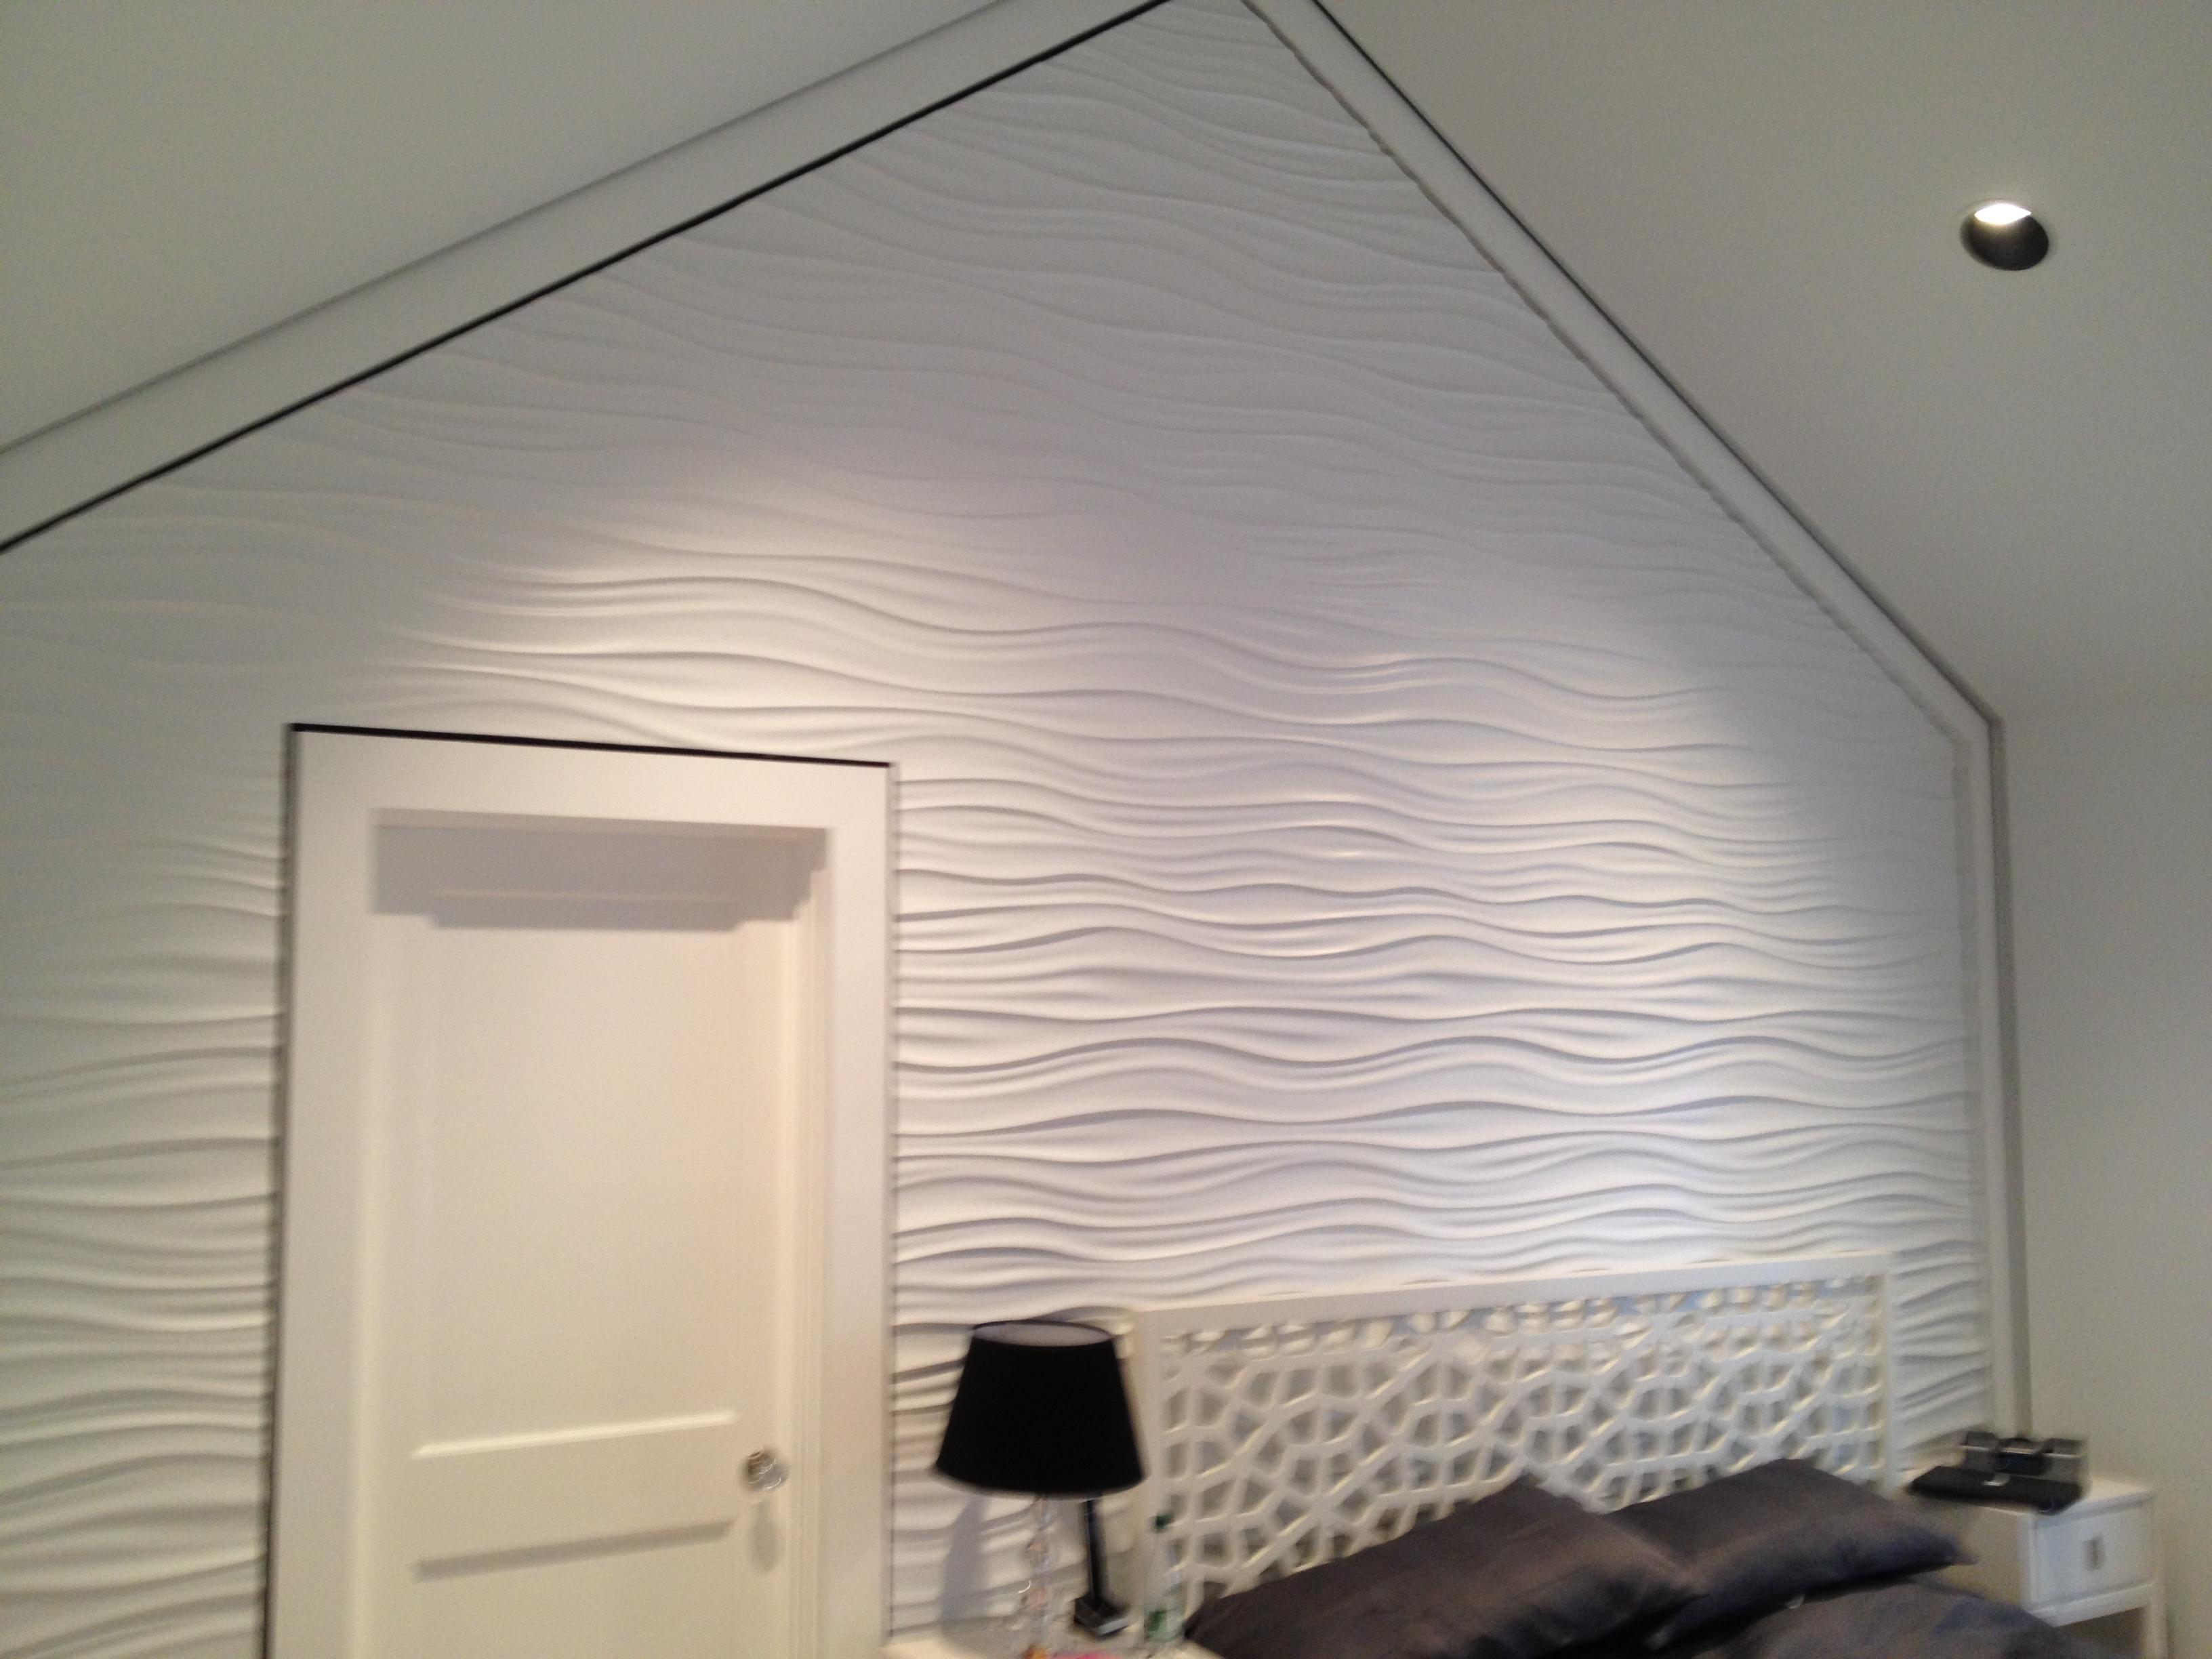 Plaster Tile Plaster Tile Bedroom ...